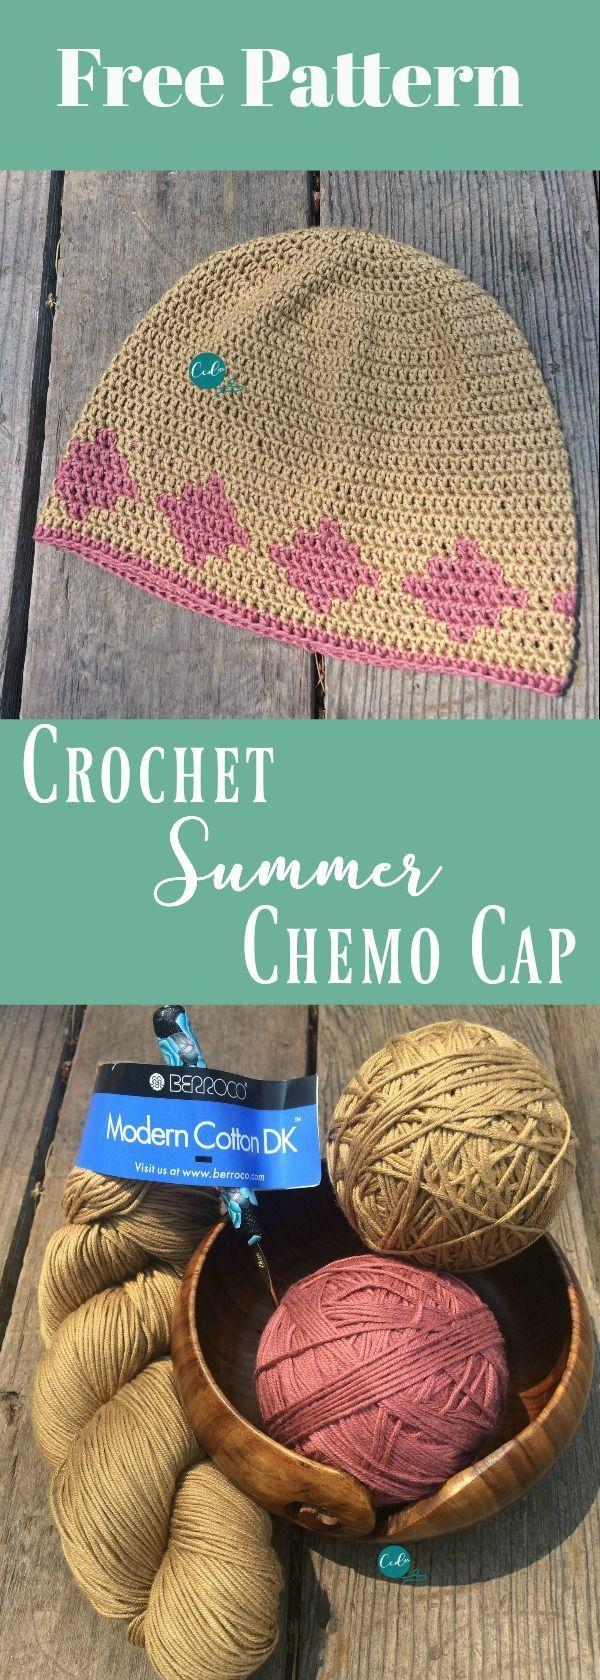 Crochet for cancer | summer chemo cap free pattern | free hat pattern | cotton yarn hat | summer beanie free pattern | adult chemo cap crochet pattern | berroco modern cotton dk hat